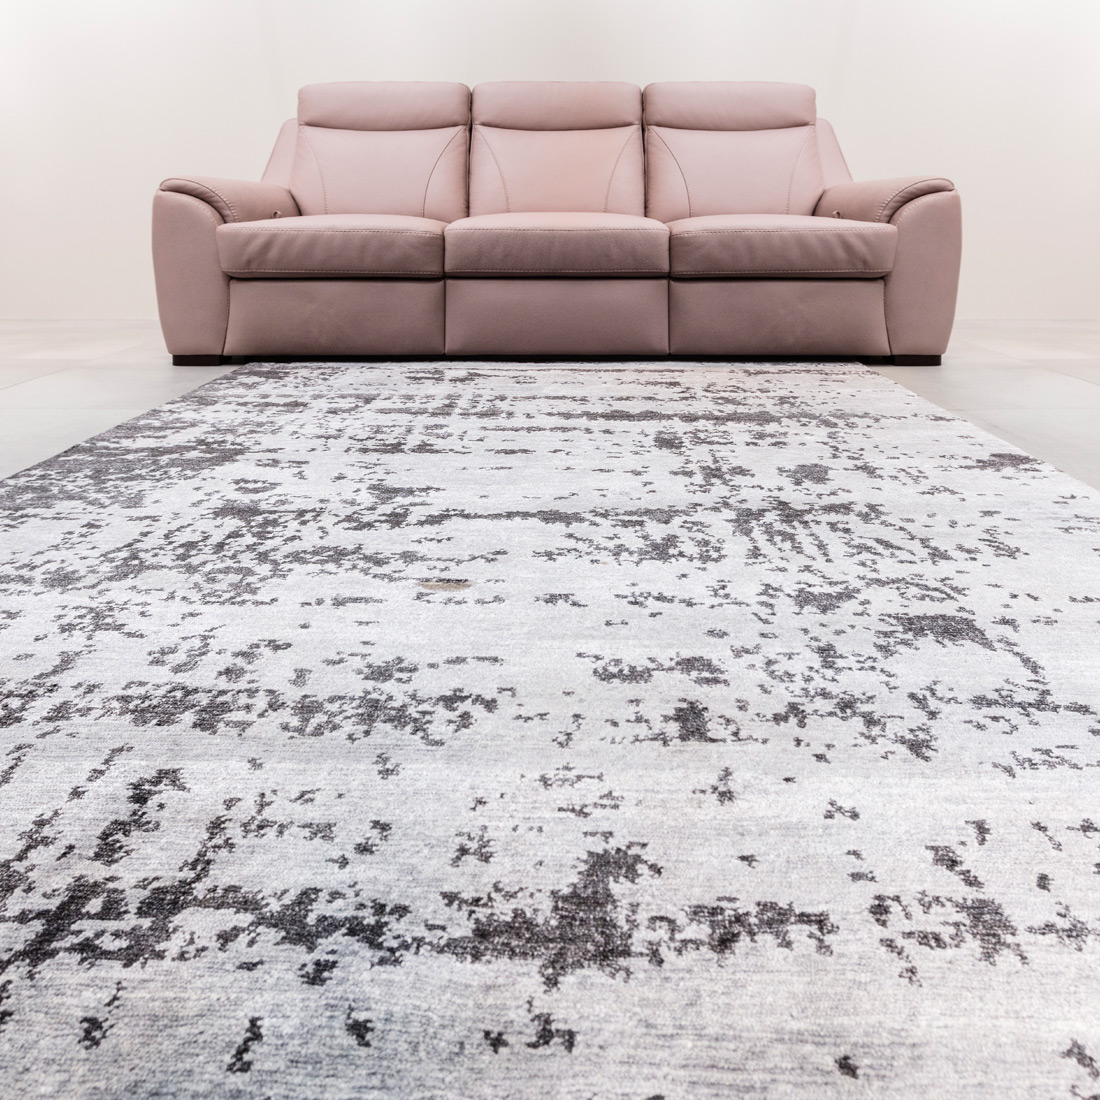 Vloerkleed Xilento Bamboo Grey | 200 x 300 cm